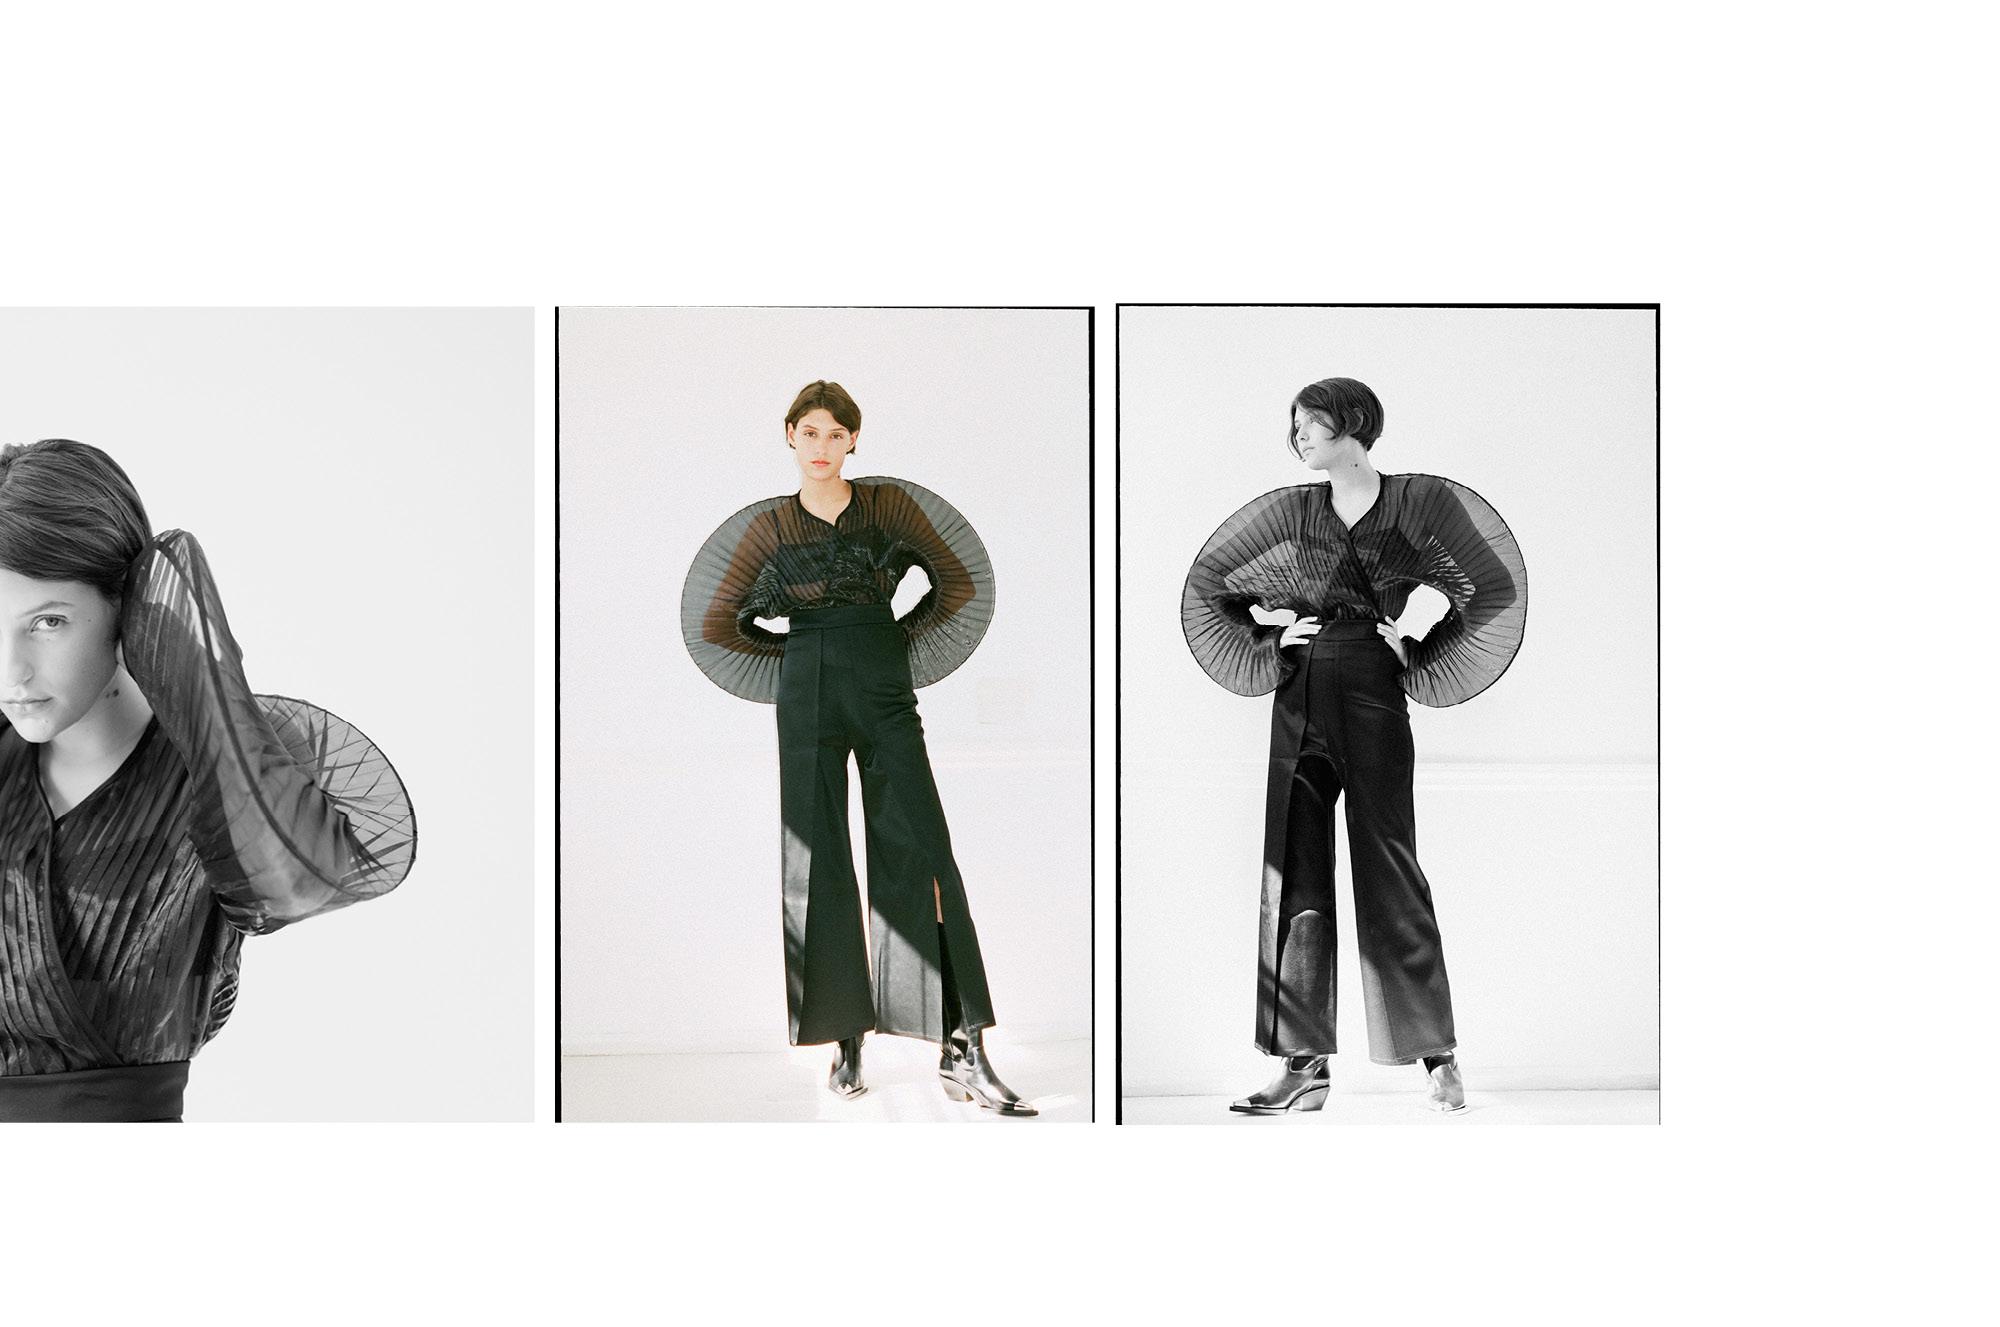 Shirt & Trousers: Sid Niegum; Bra:Eres; Boots: Helmut Lang.